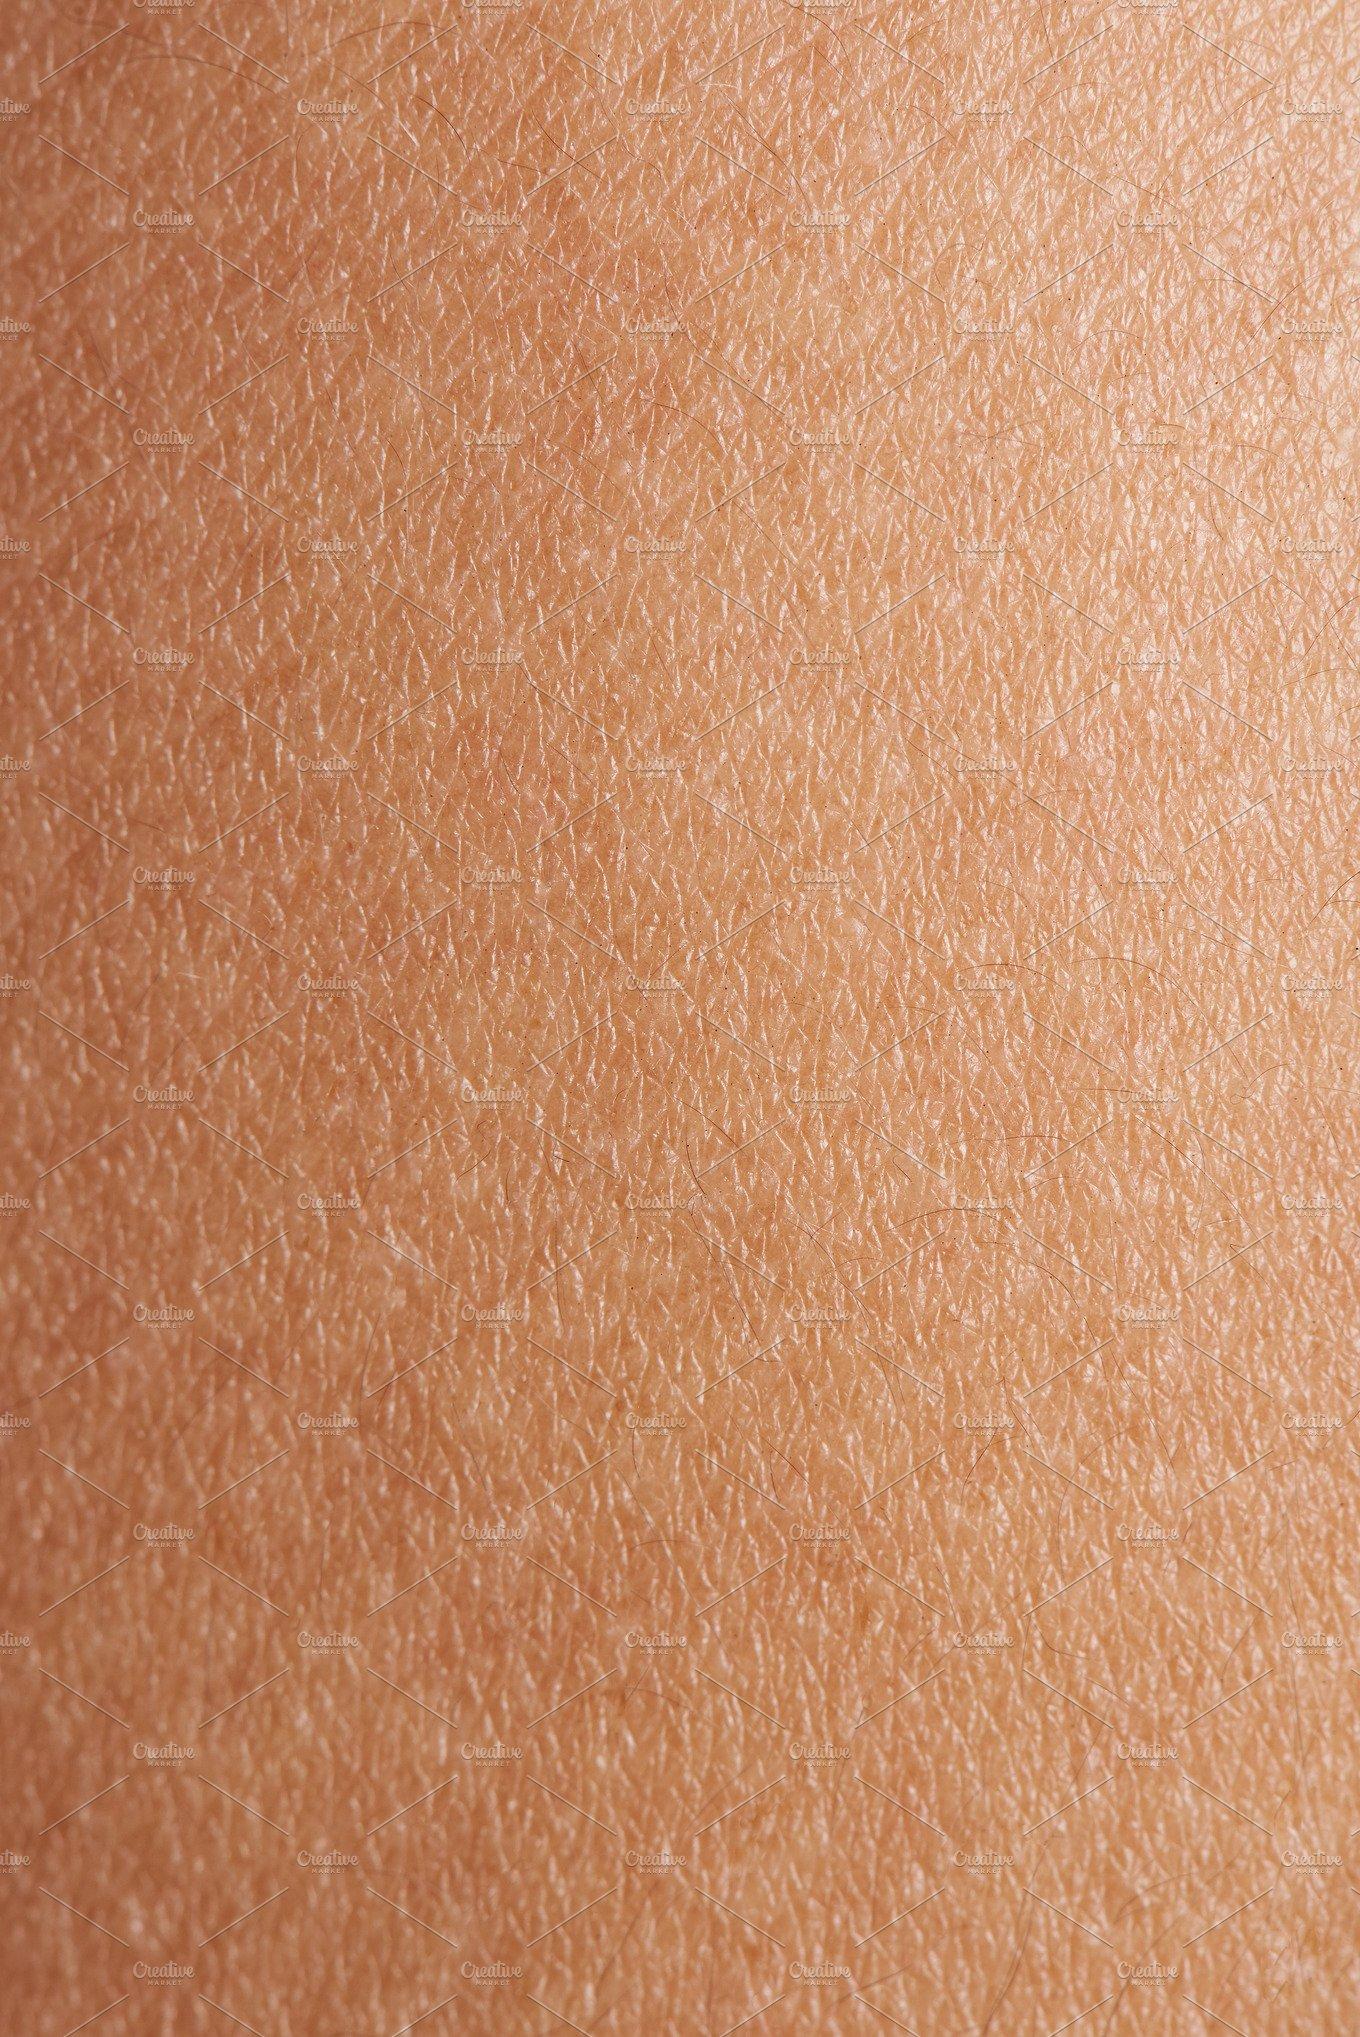 Human skin texture ~ People Photos ~ Creative Market